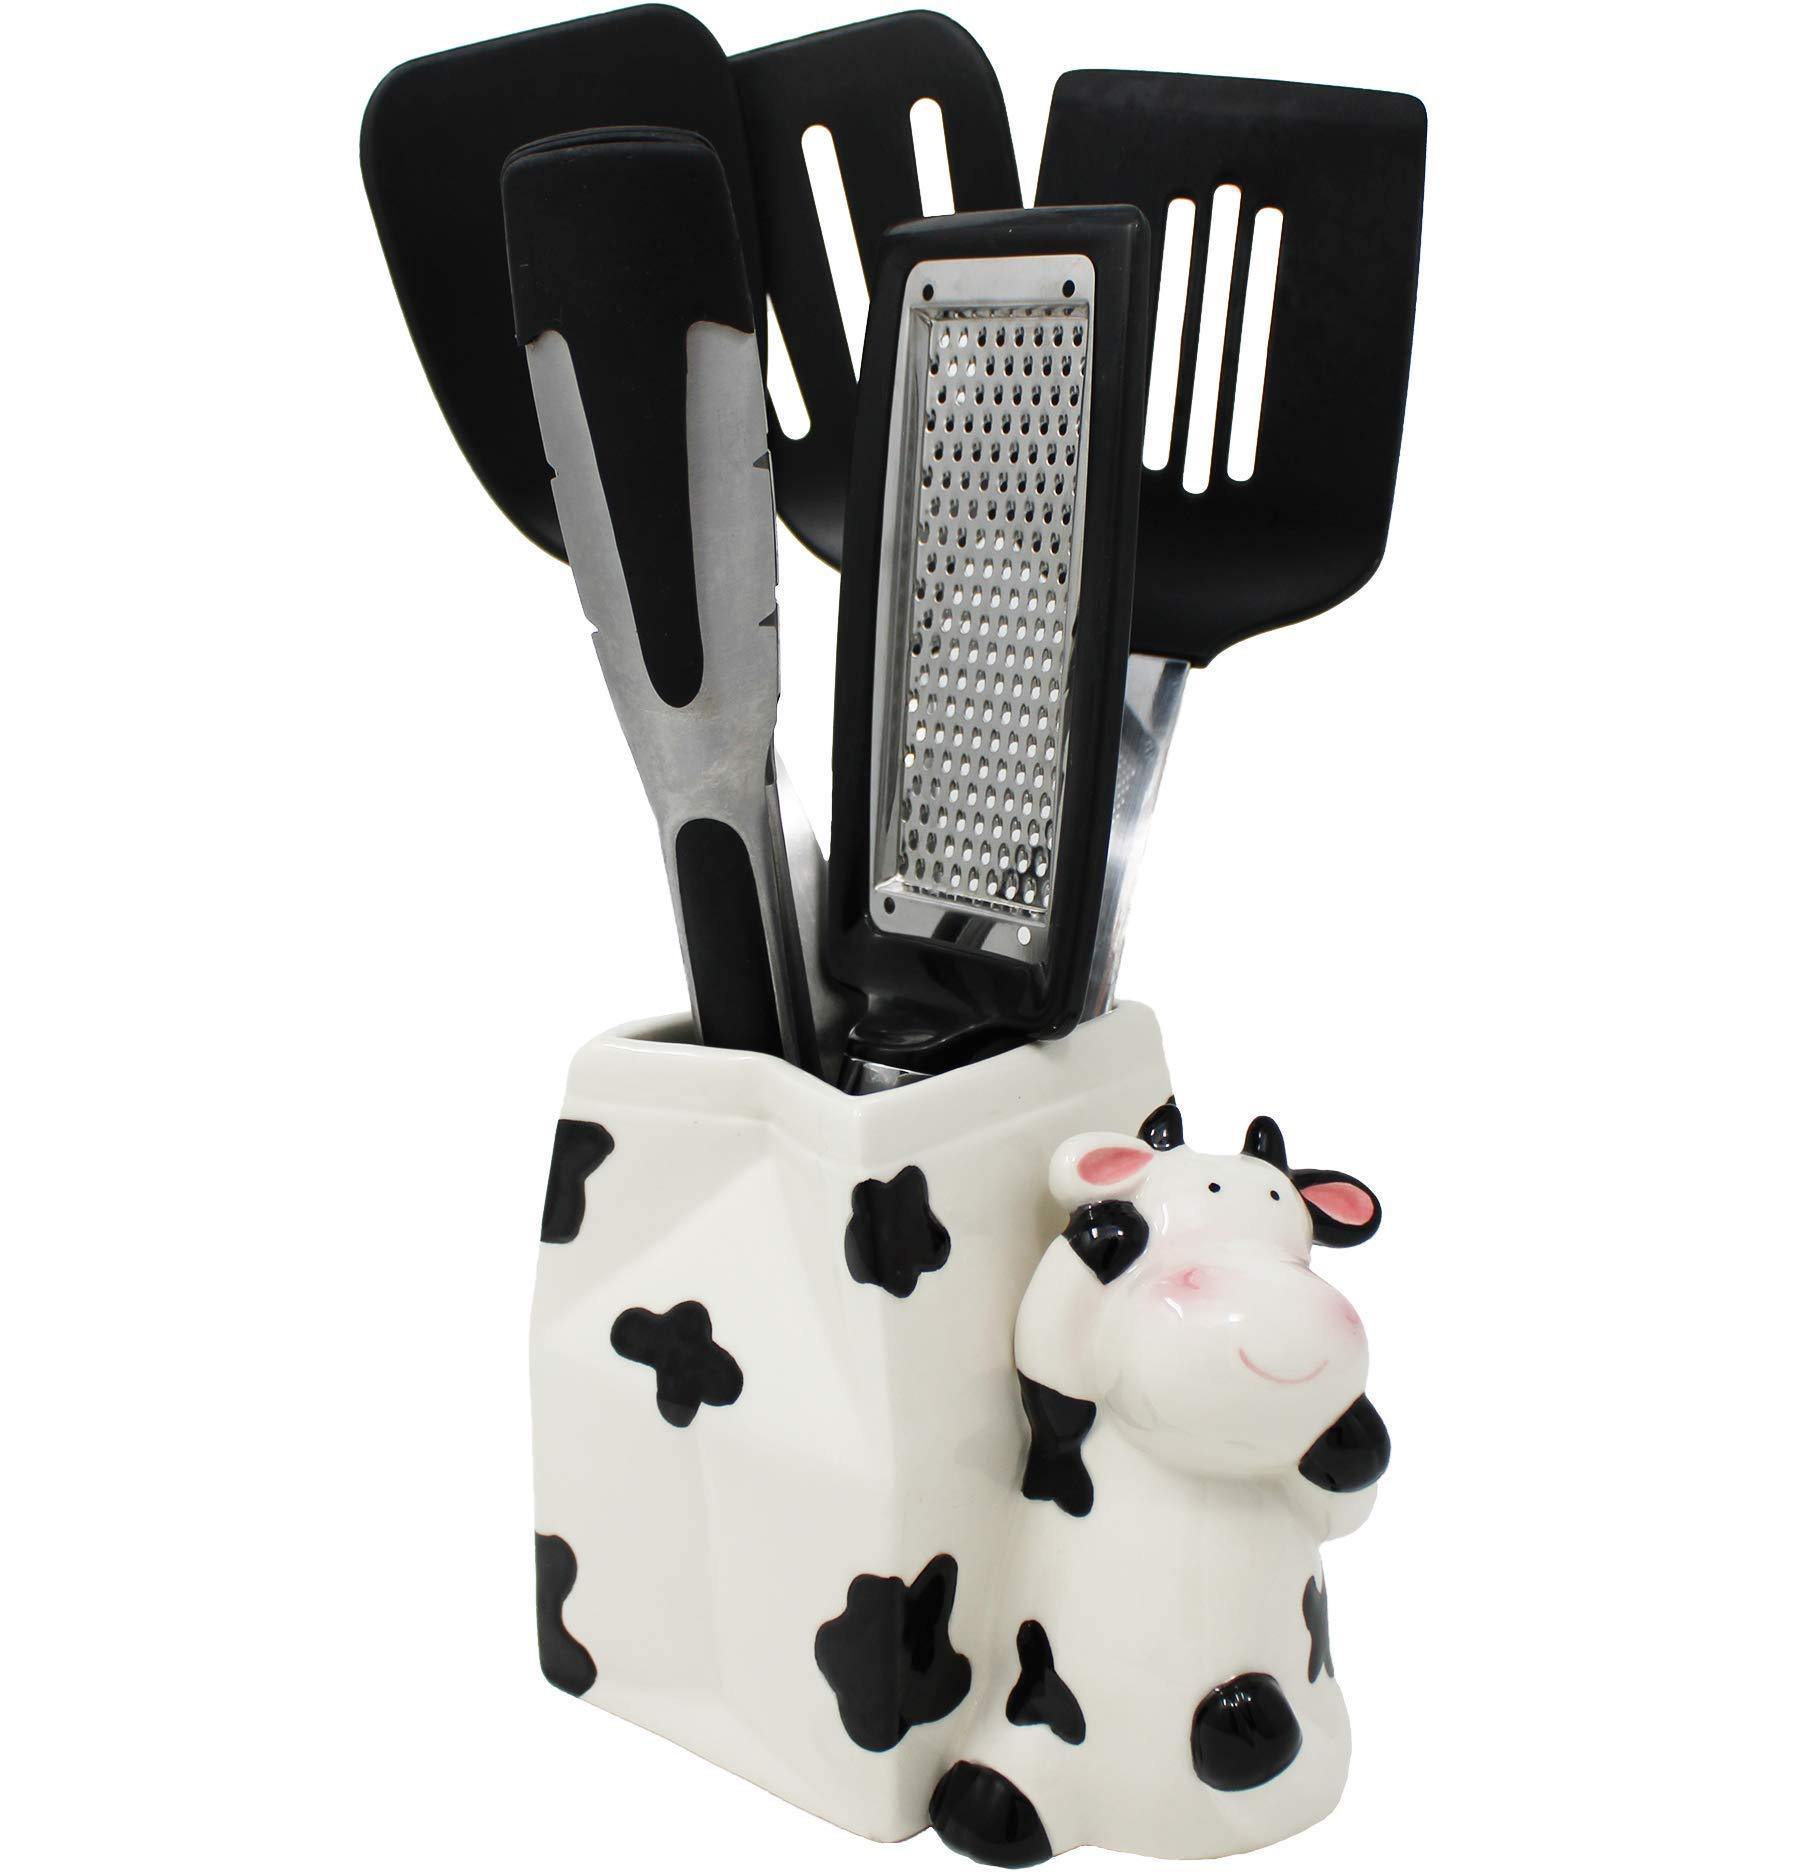 Sixdrop Cow Utensil Holder Cow Kitchen Utensil Holder Multipurpose Cow Farmhouse Decor Kitchen Crock Storage Farm Decorations Decor Gift Cow Kitchen Decor Ceramic Holder Buy Online At Best Price In Uae